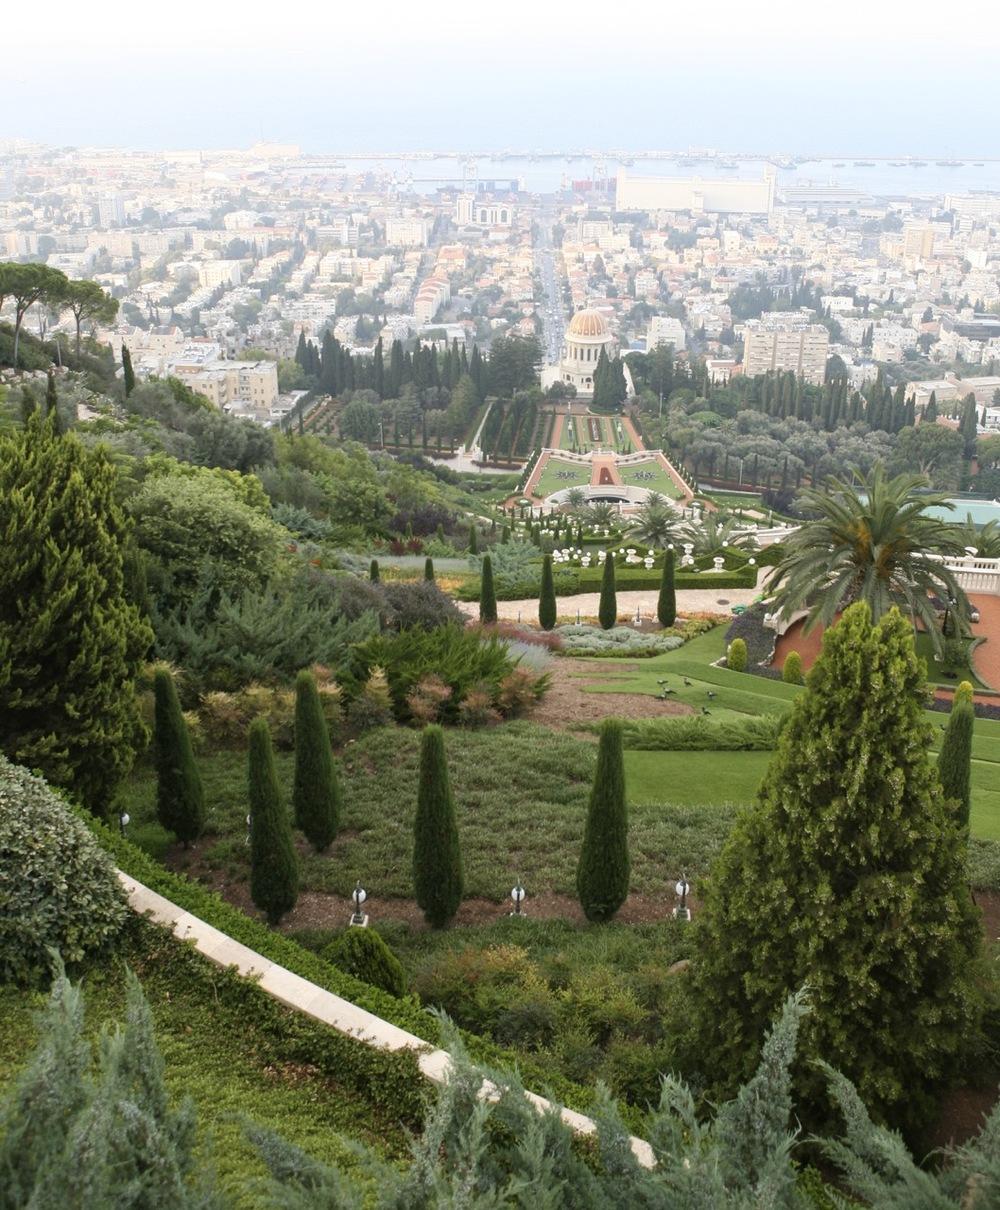 thegoodgarden|bahaitemple|haifa|davidcalle1347.JPG.jpg